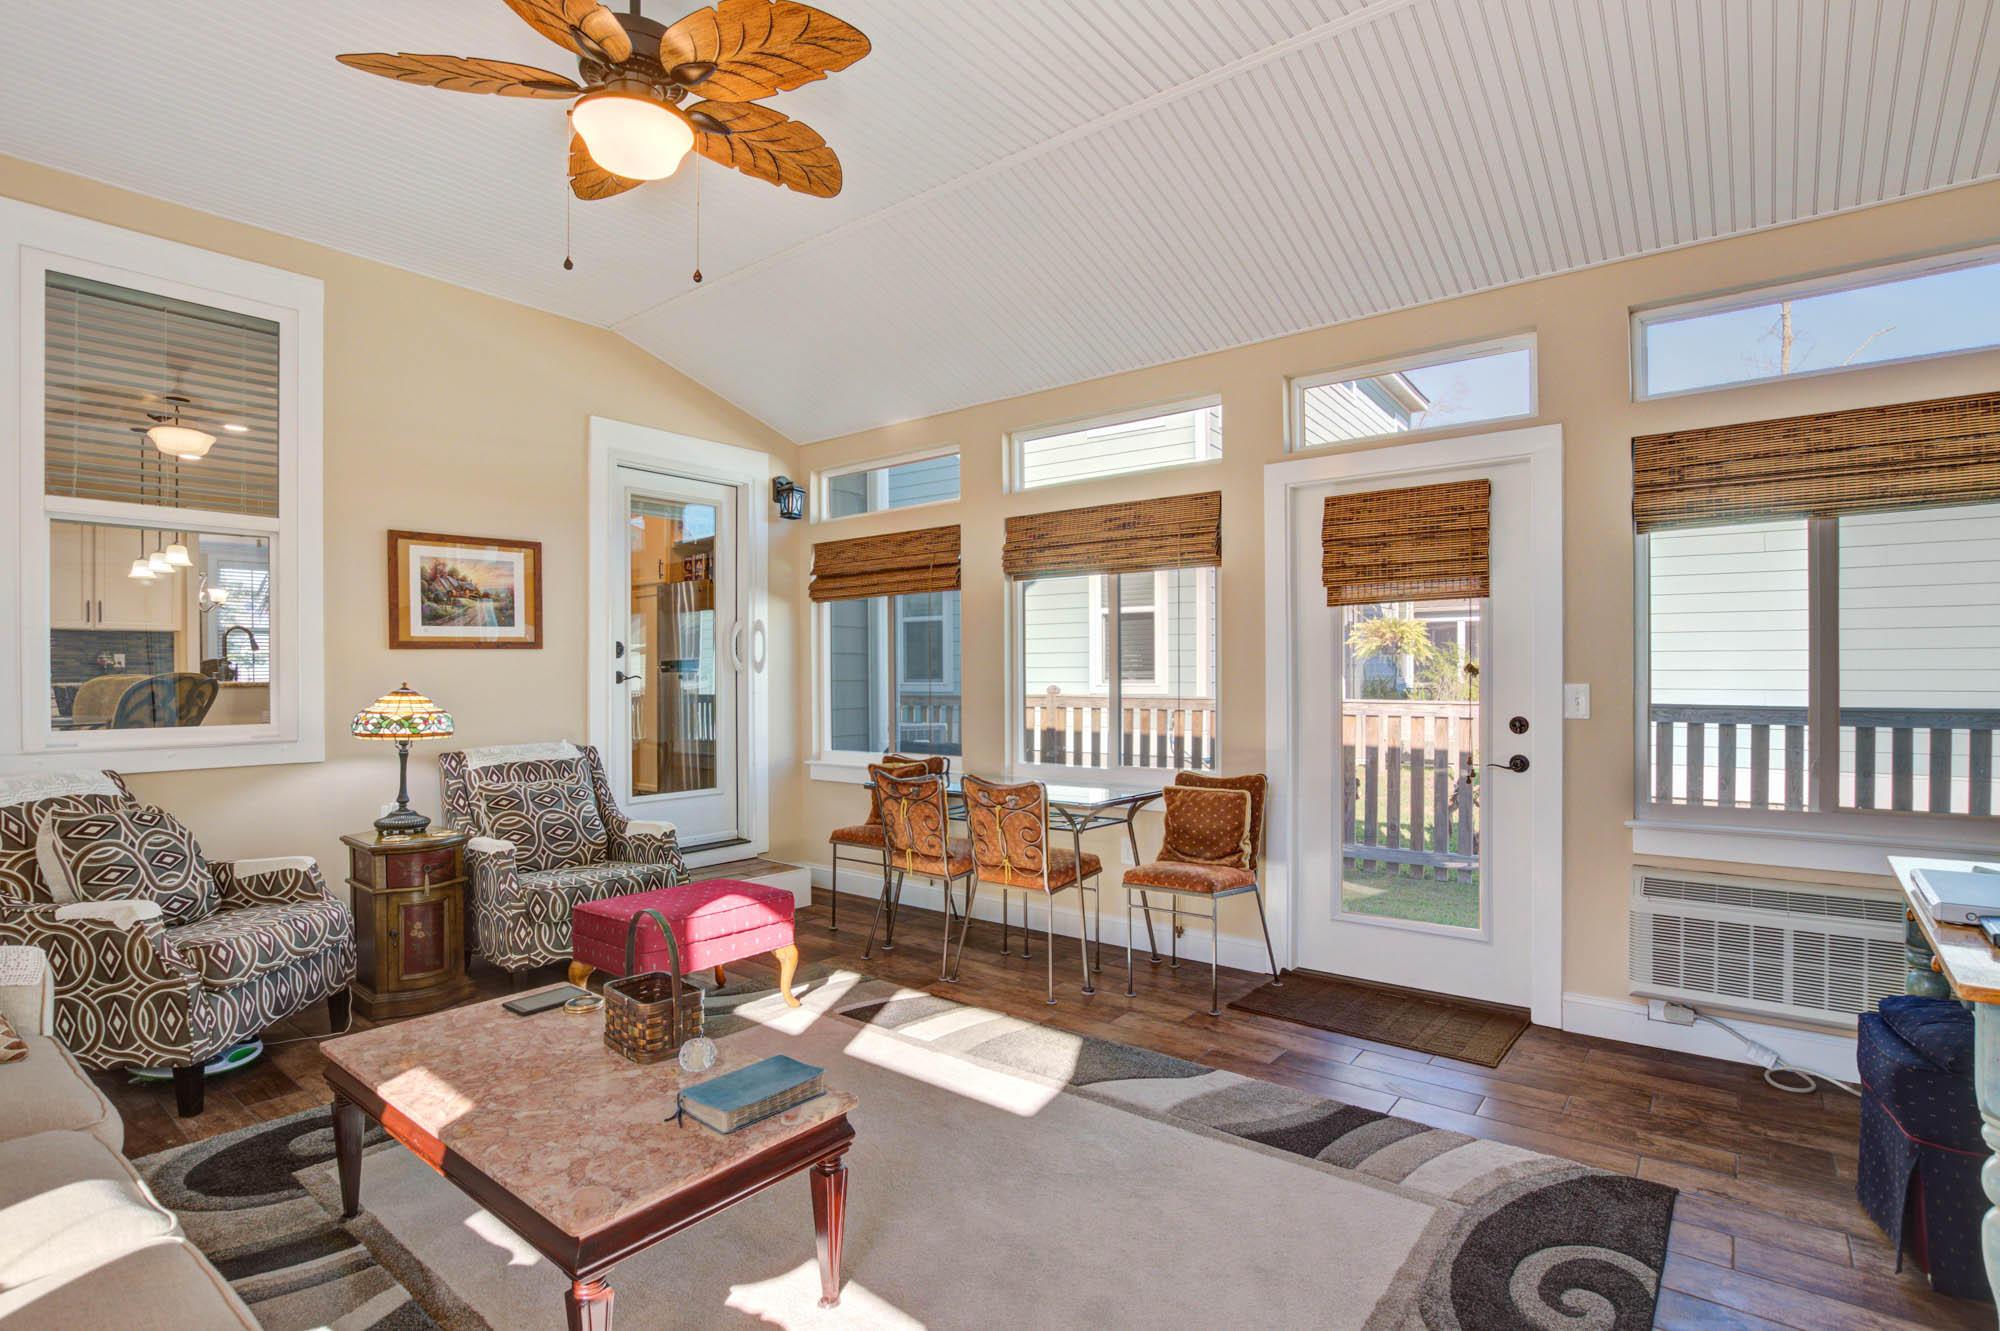 Carolina Bay Homes For Sale - 1850 Grovehurst, Charleston, SC - 40